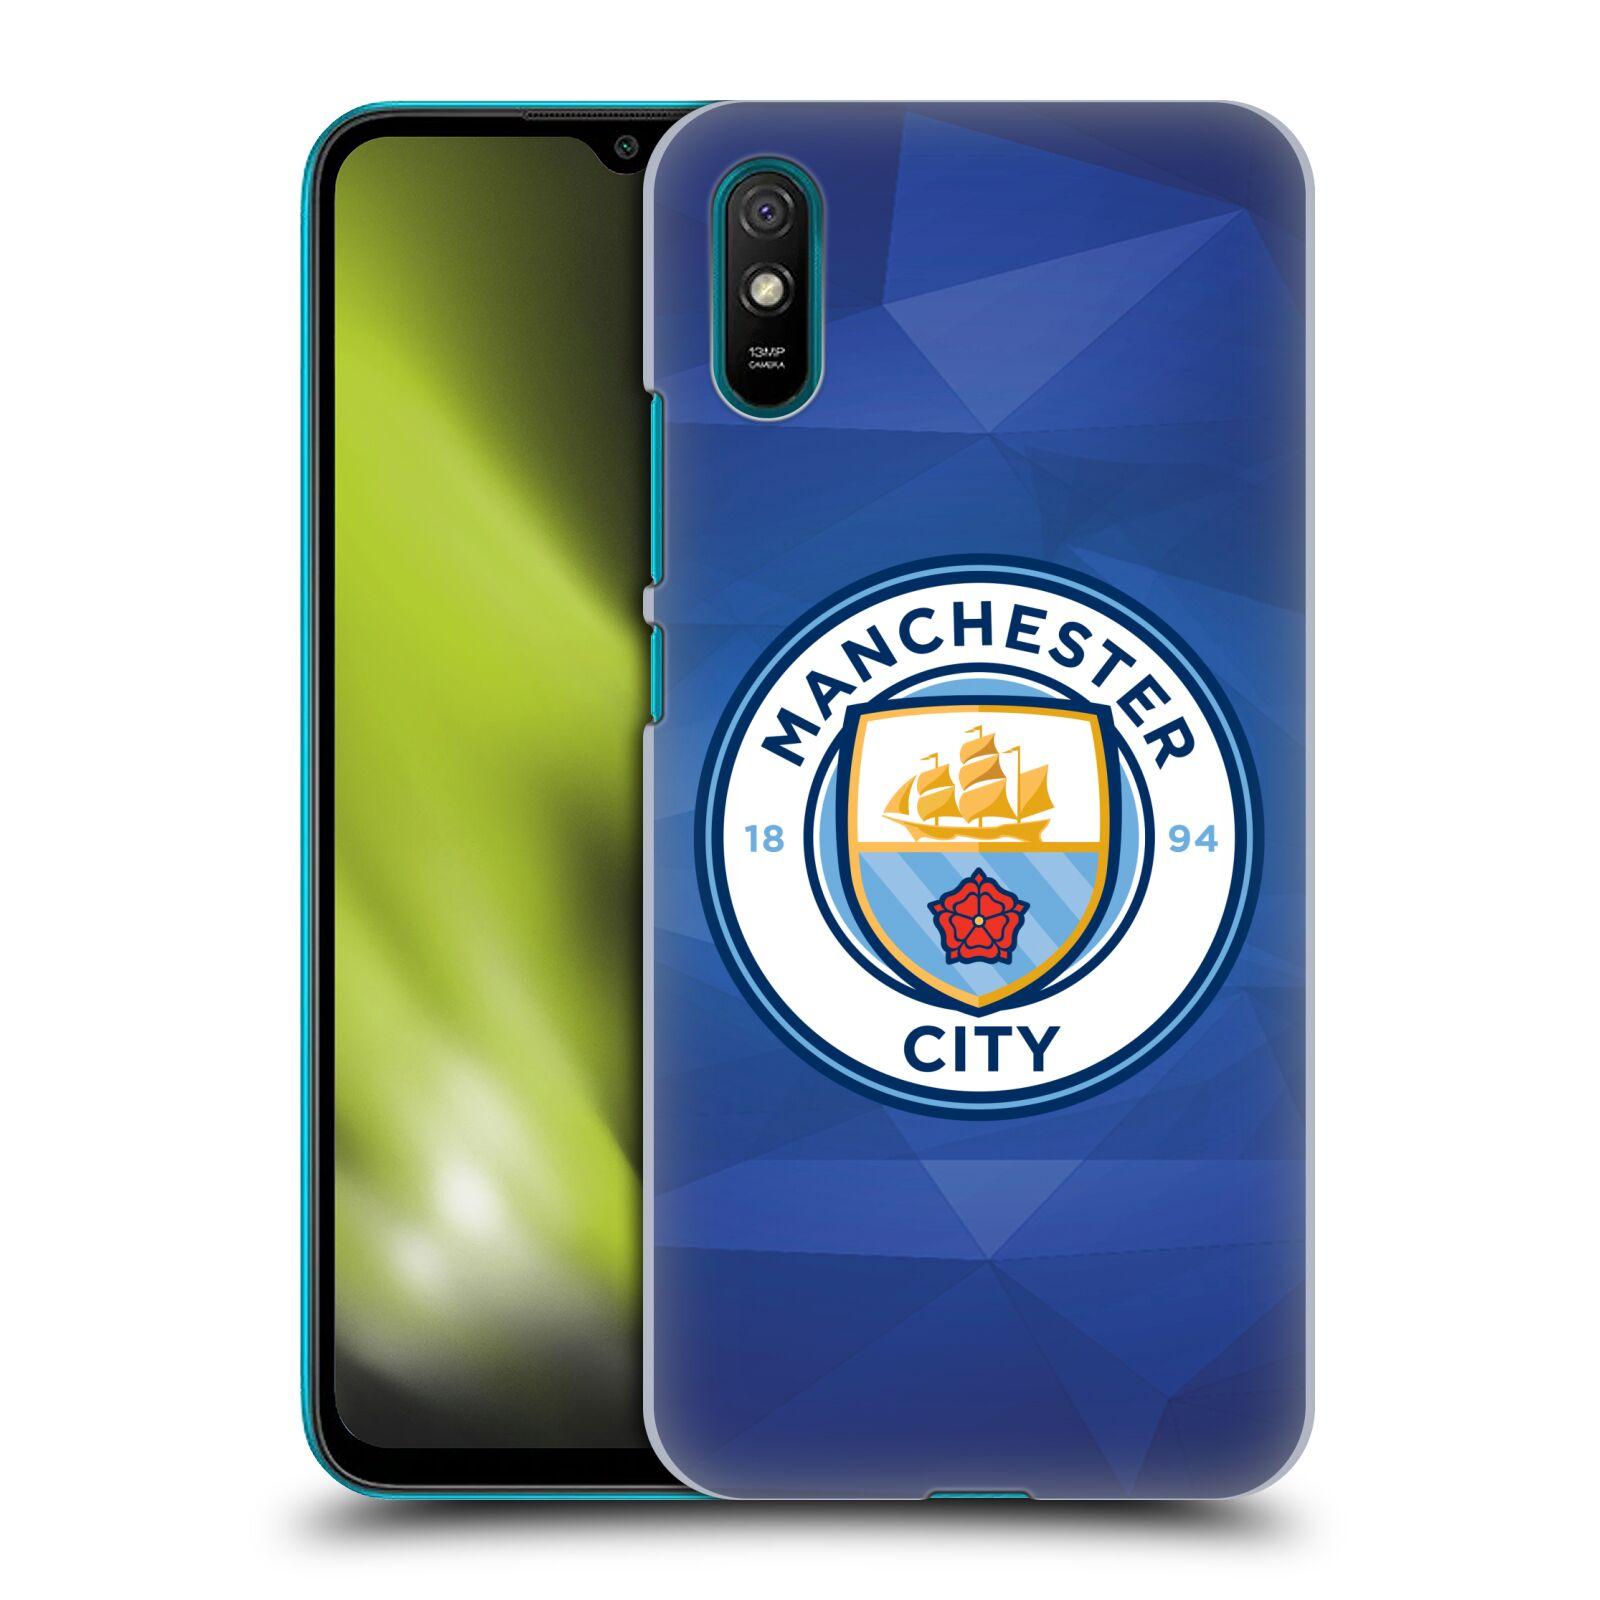 Plastové pouzdro na mobil Xiaomi Redmi 9A / Xiaomi Redmi 9AT - Head Case - Manchester City FC - Modré nové logo